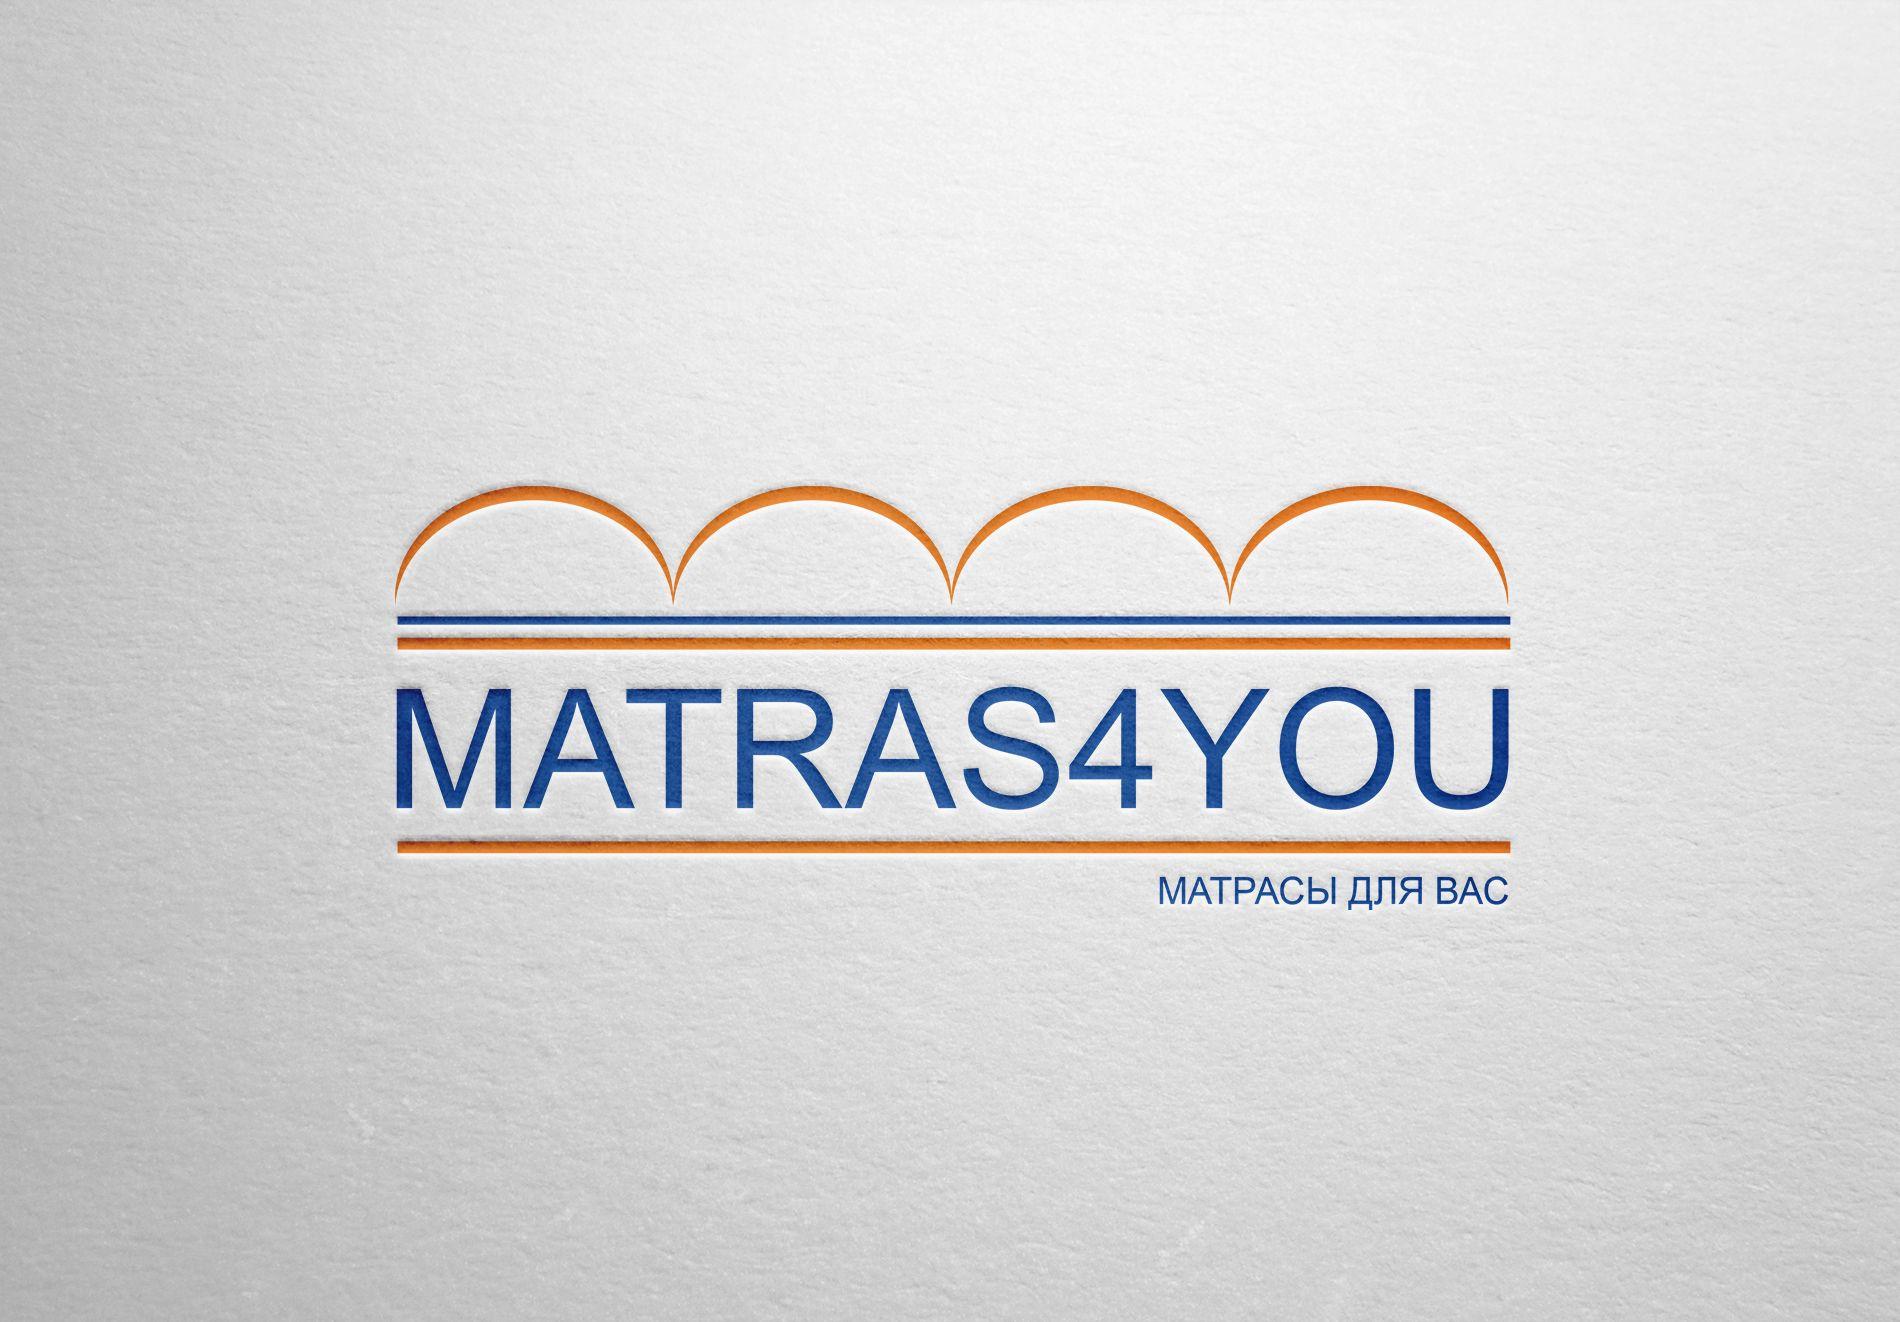 matras4u - дизайнер La_persona